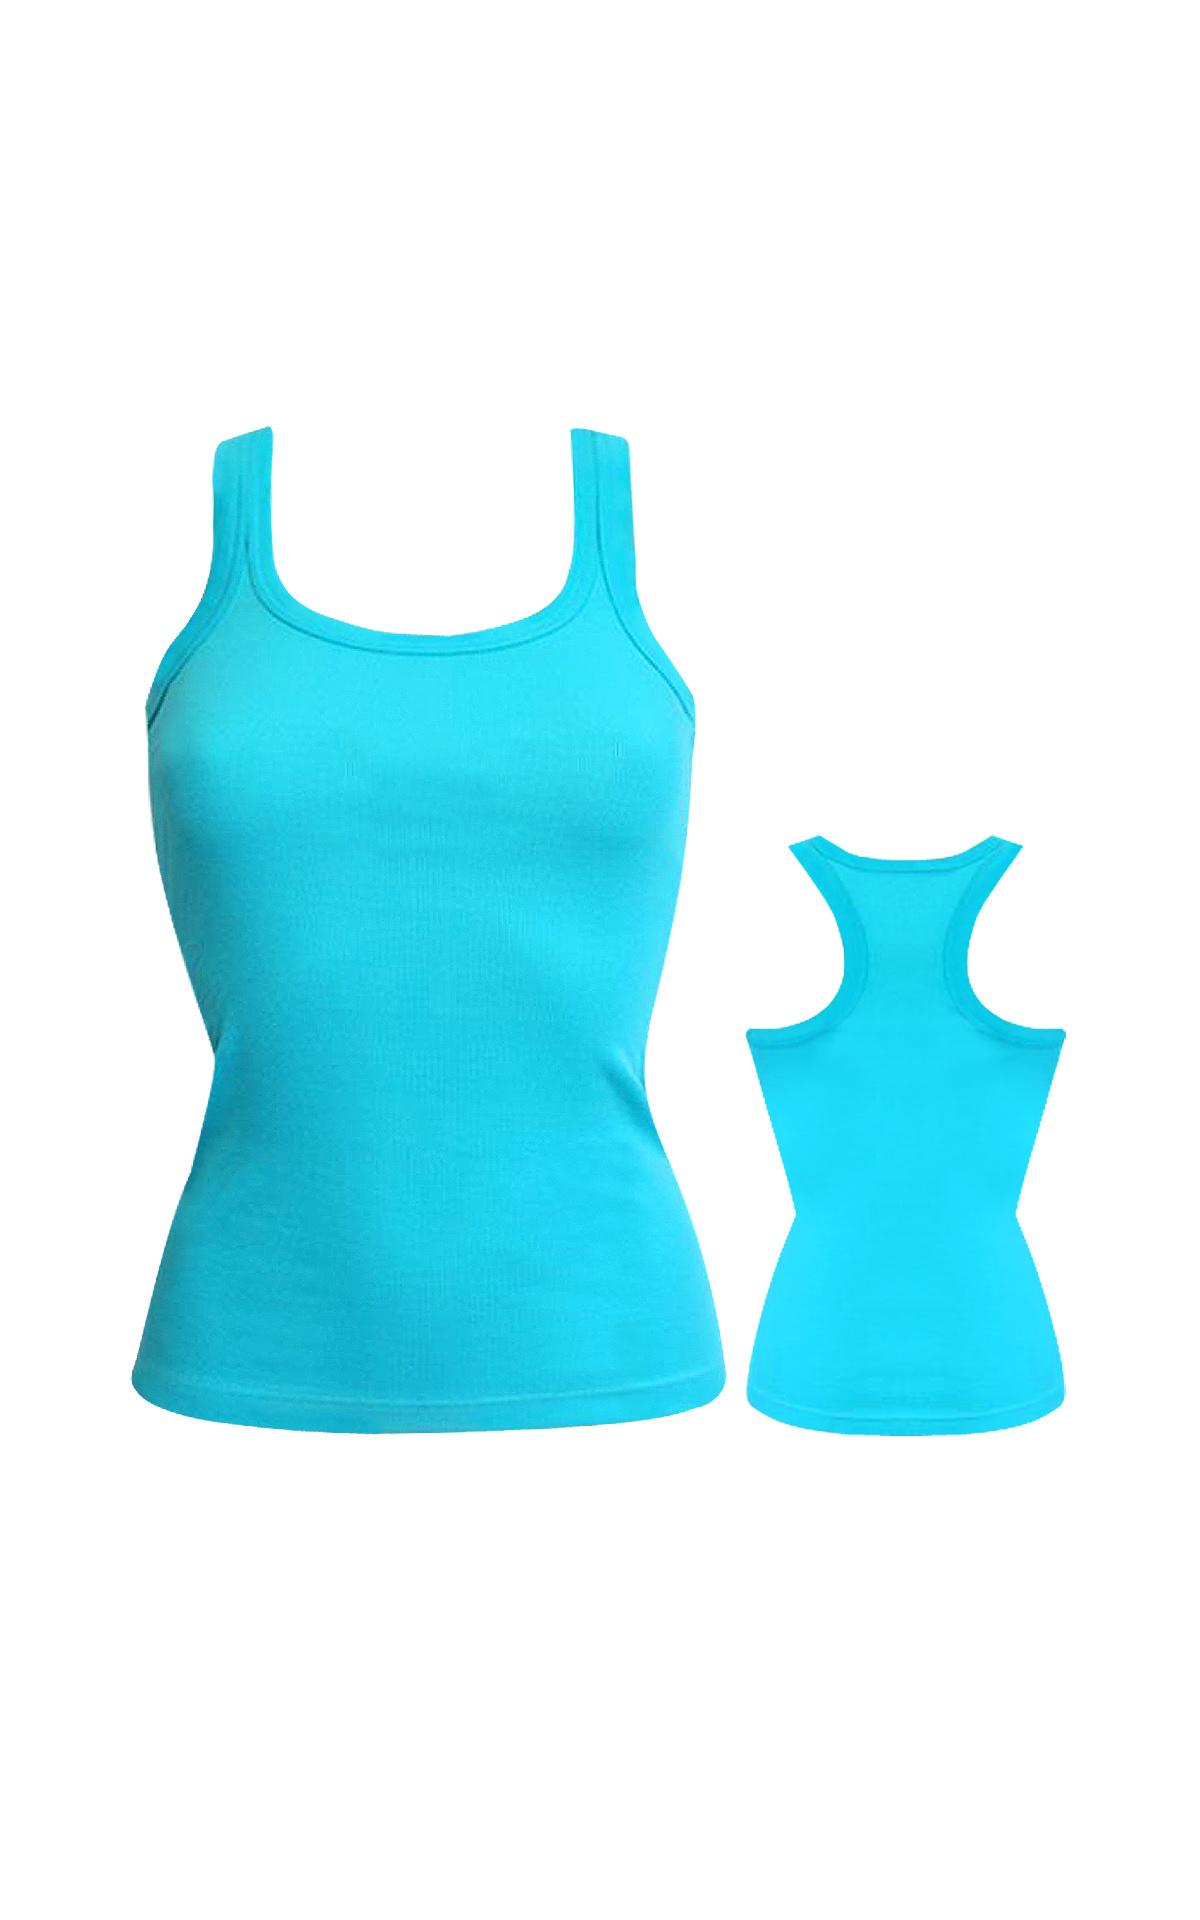 9d70000d333d Γυναίκα Outwear   BeachWear Top Φανέλα Γυναικεία Αθλητική Cotton Elastan